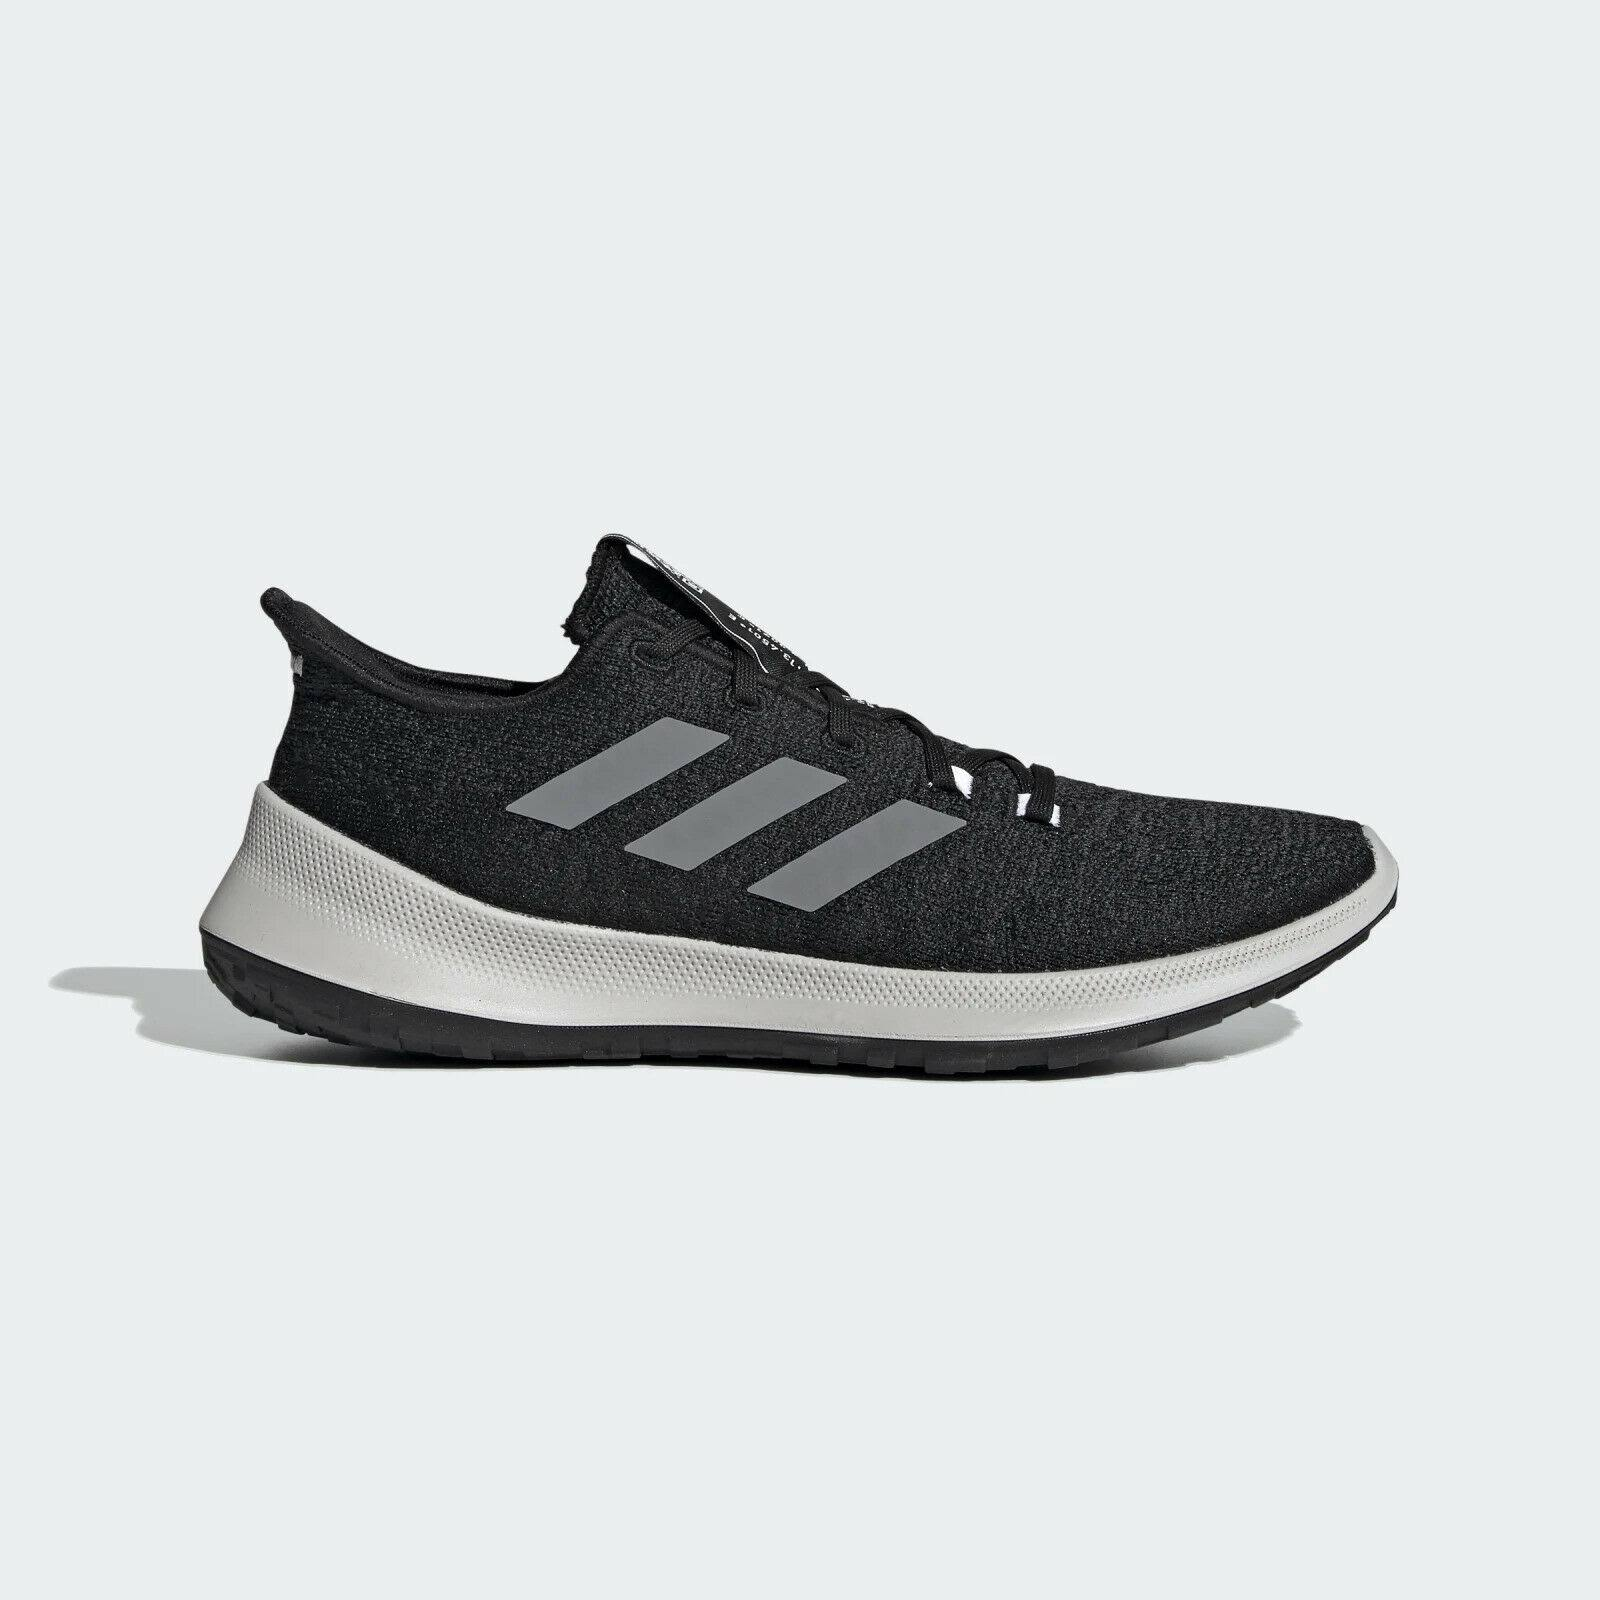 Adidas Sensebounce Mens Running Shoes - Black/White